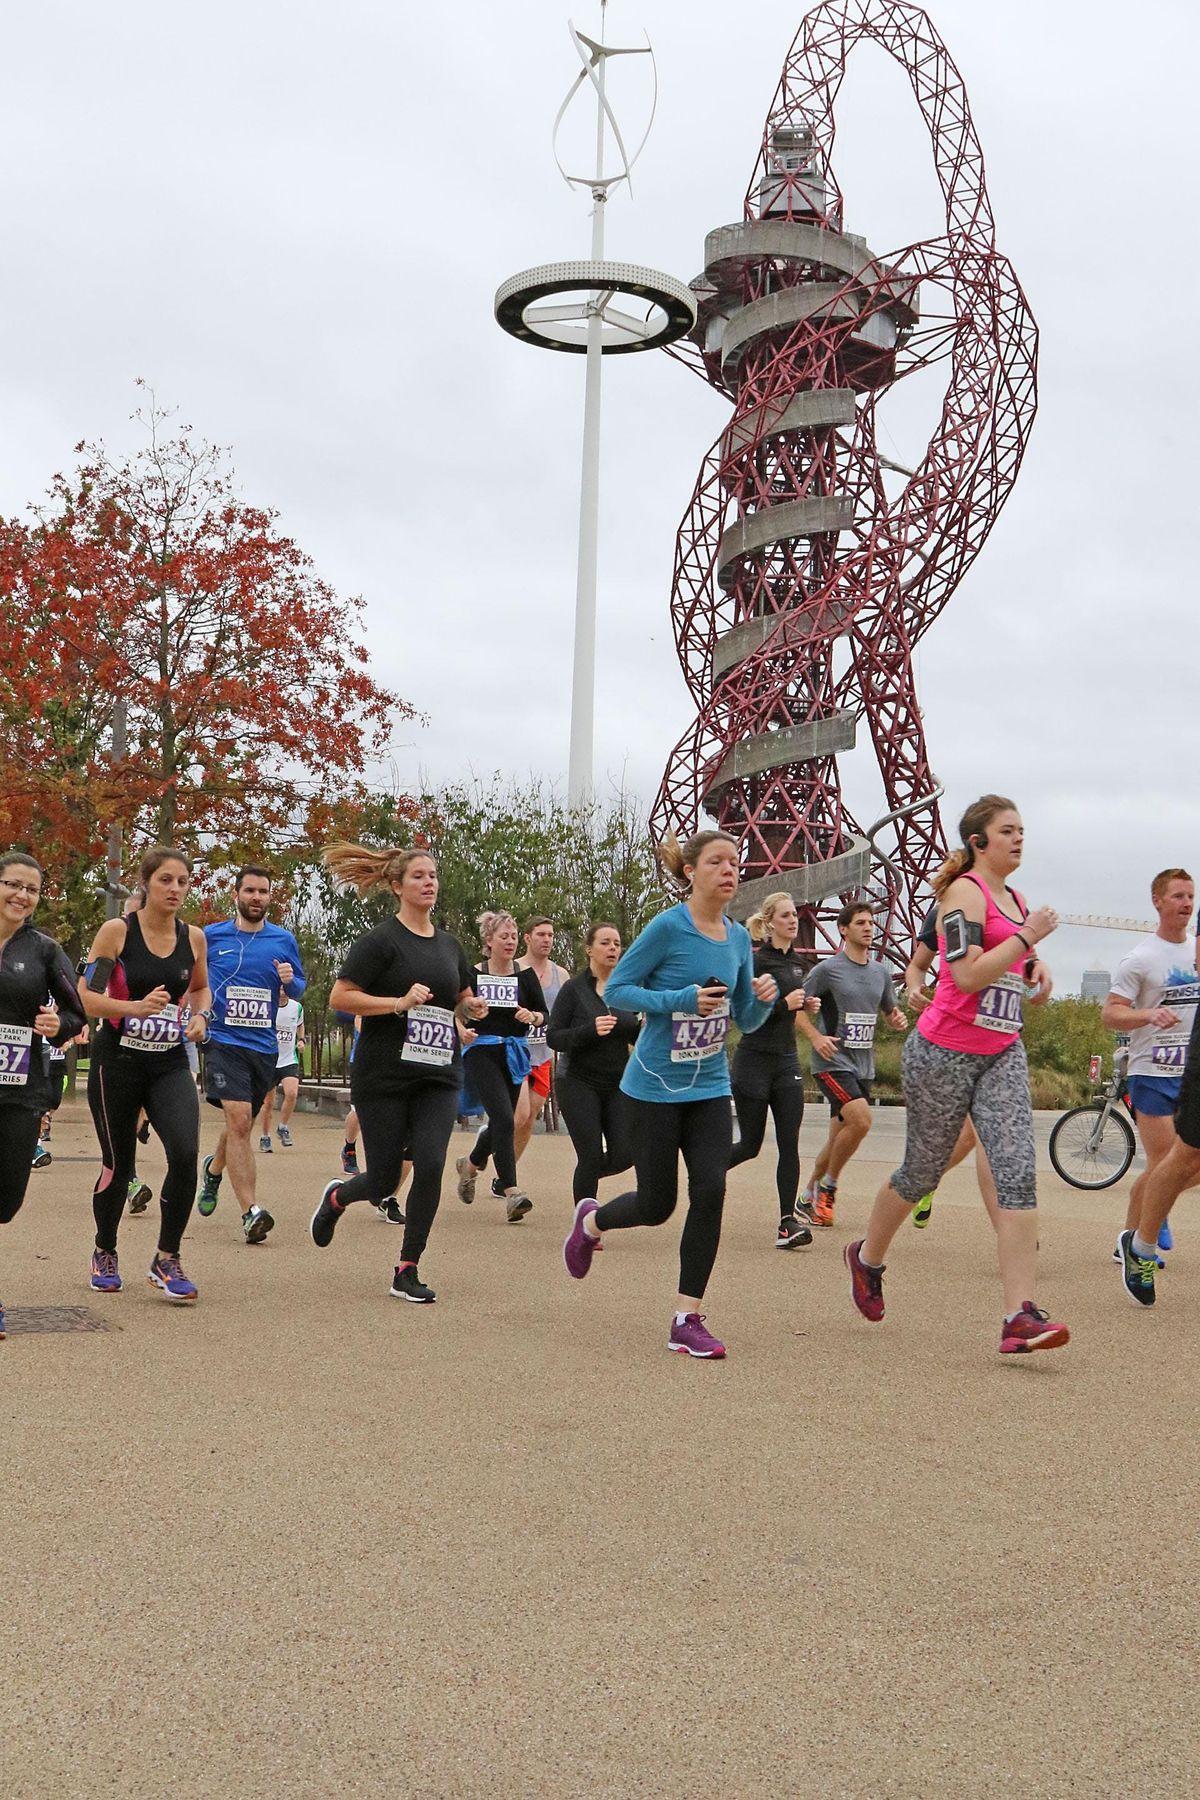 Queen Elizabeth Olympic Park Summer 10K Series - April